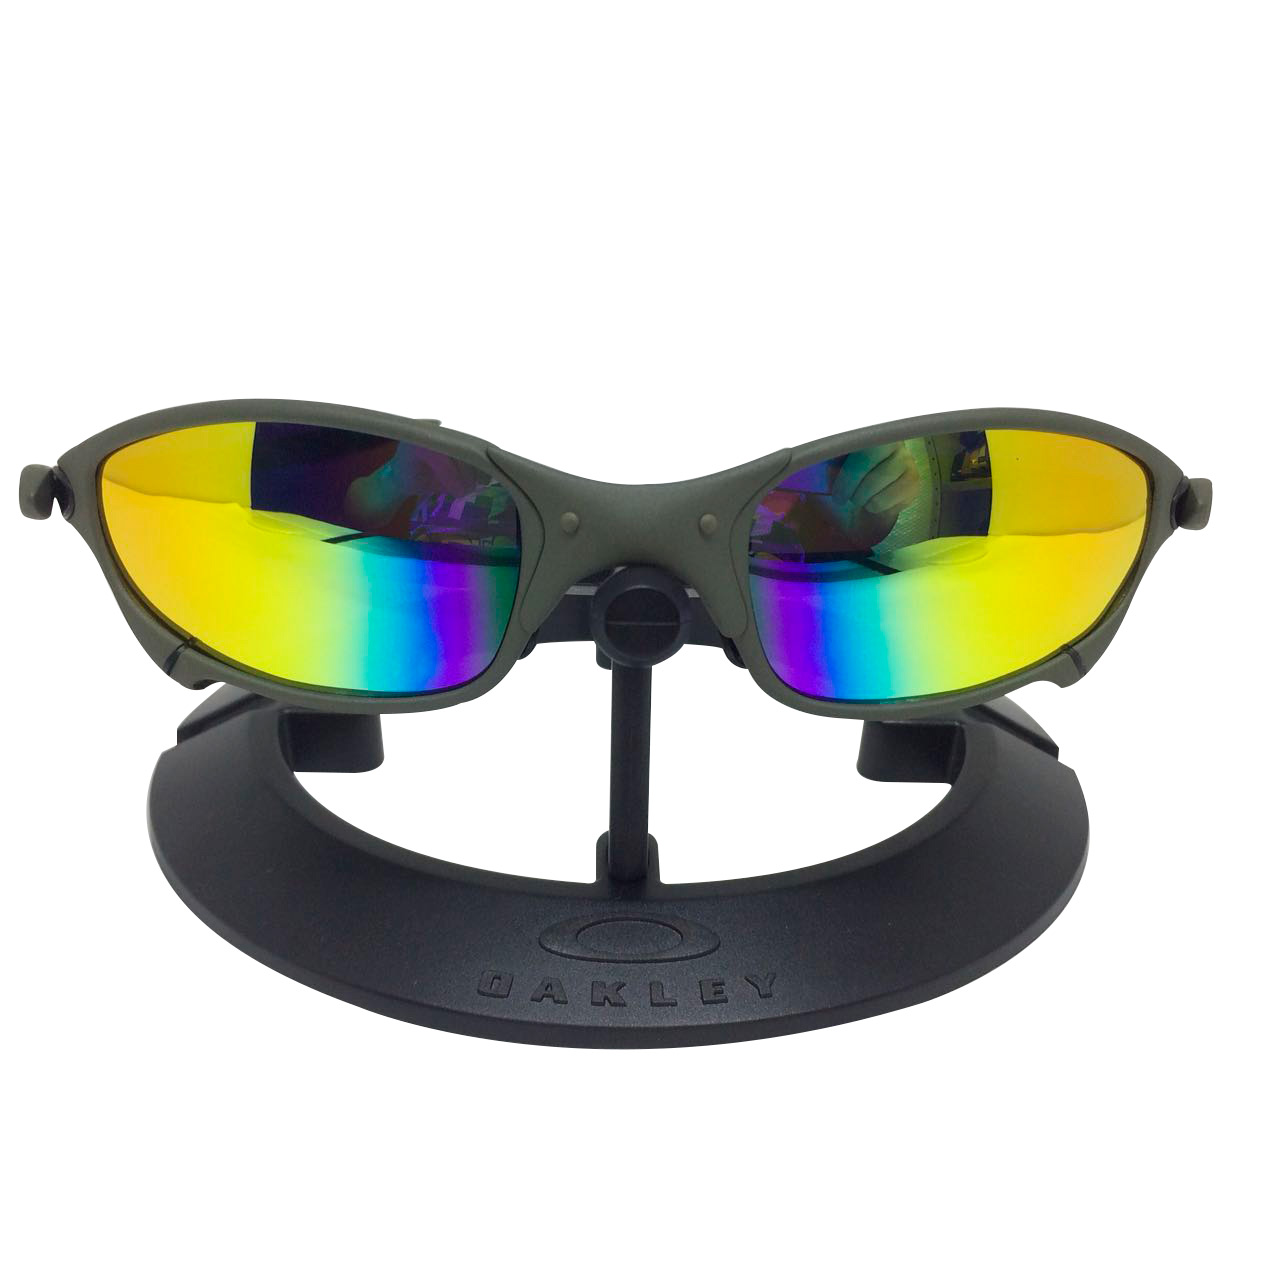 325be080a Óculos Oakley Juliet XMetal lente arco iris – Sanfer Acessórios